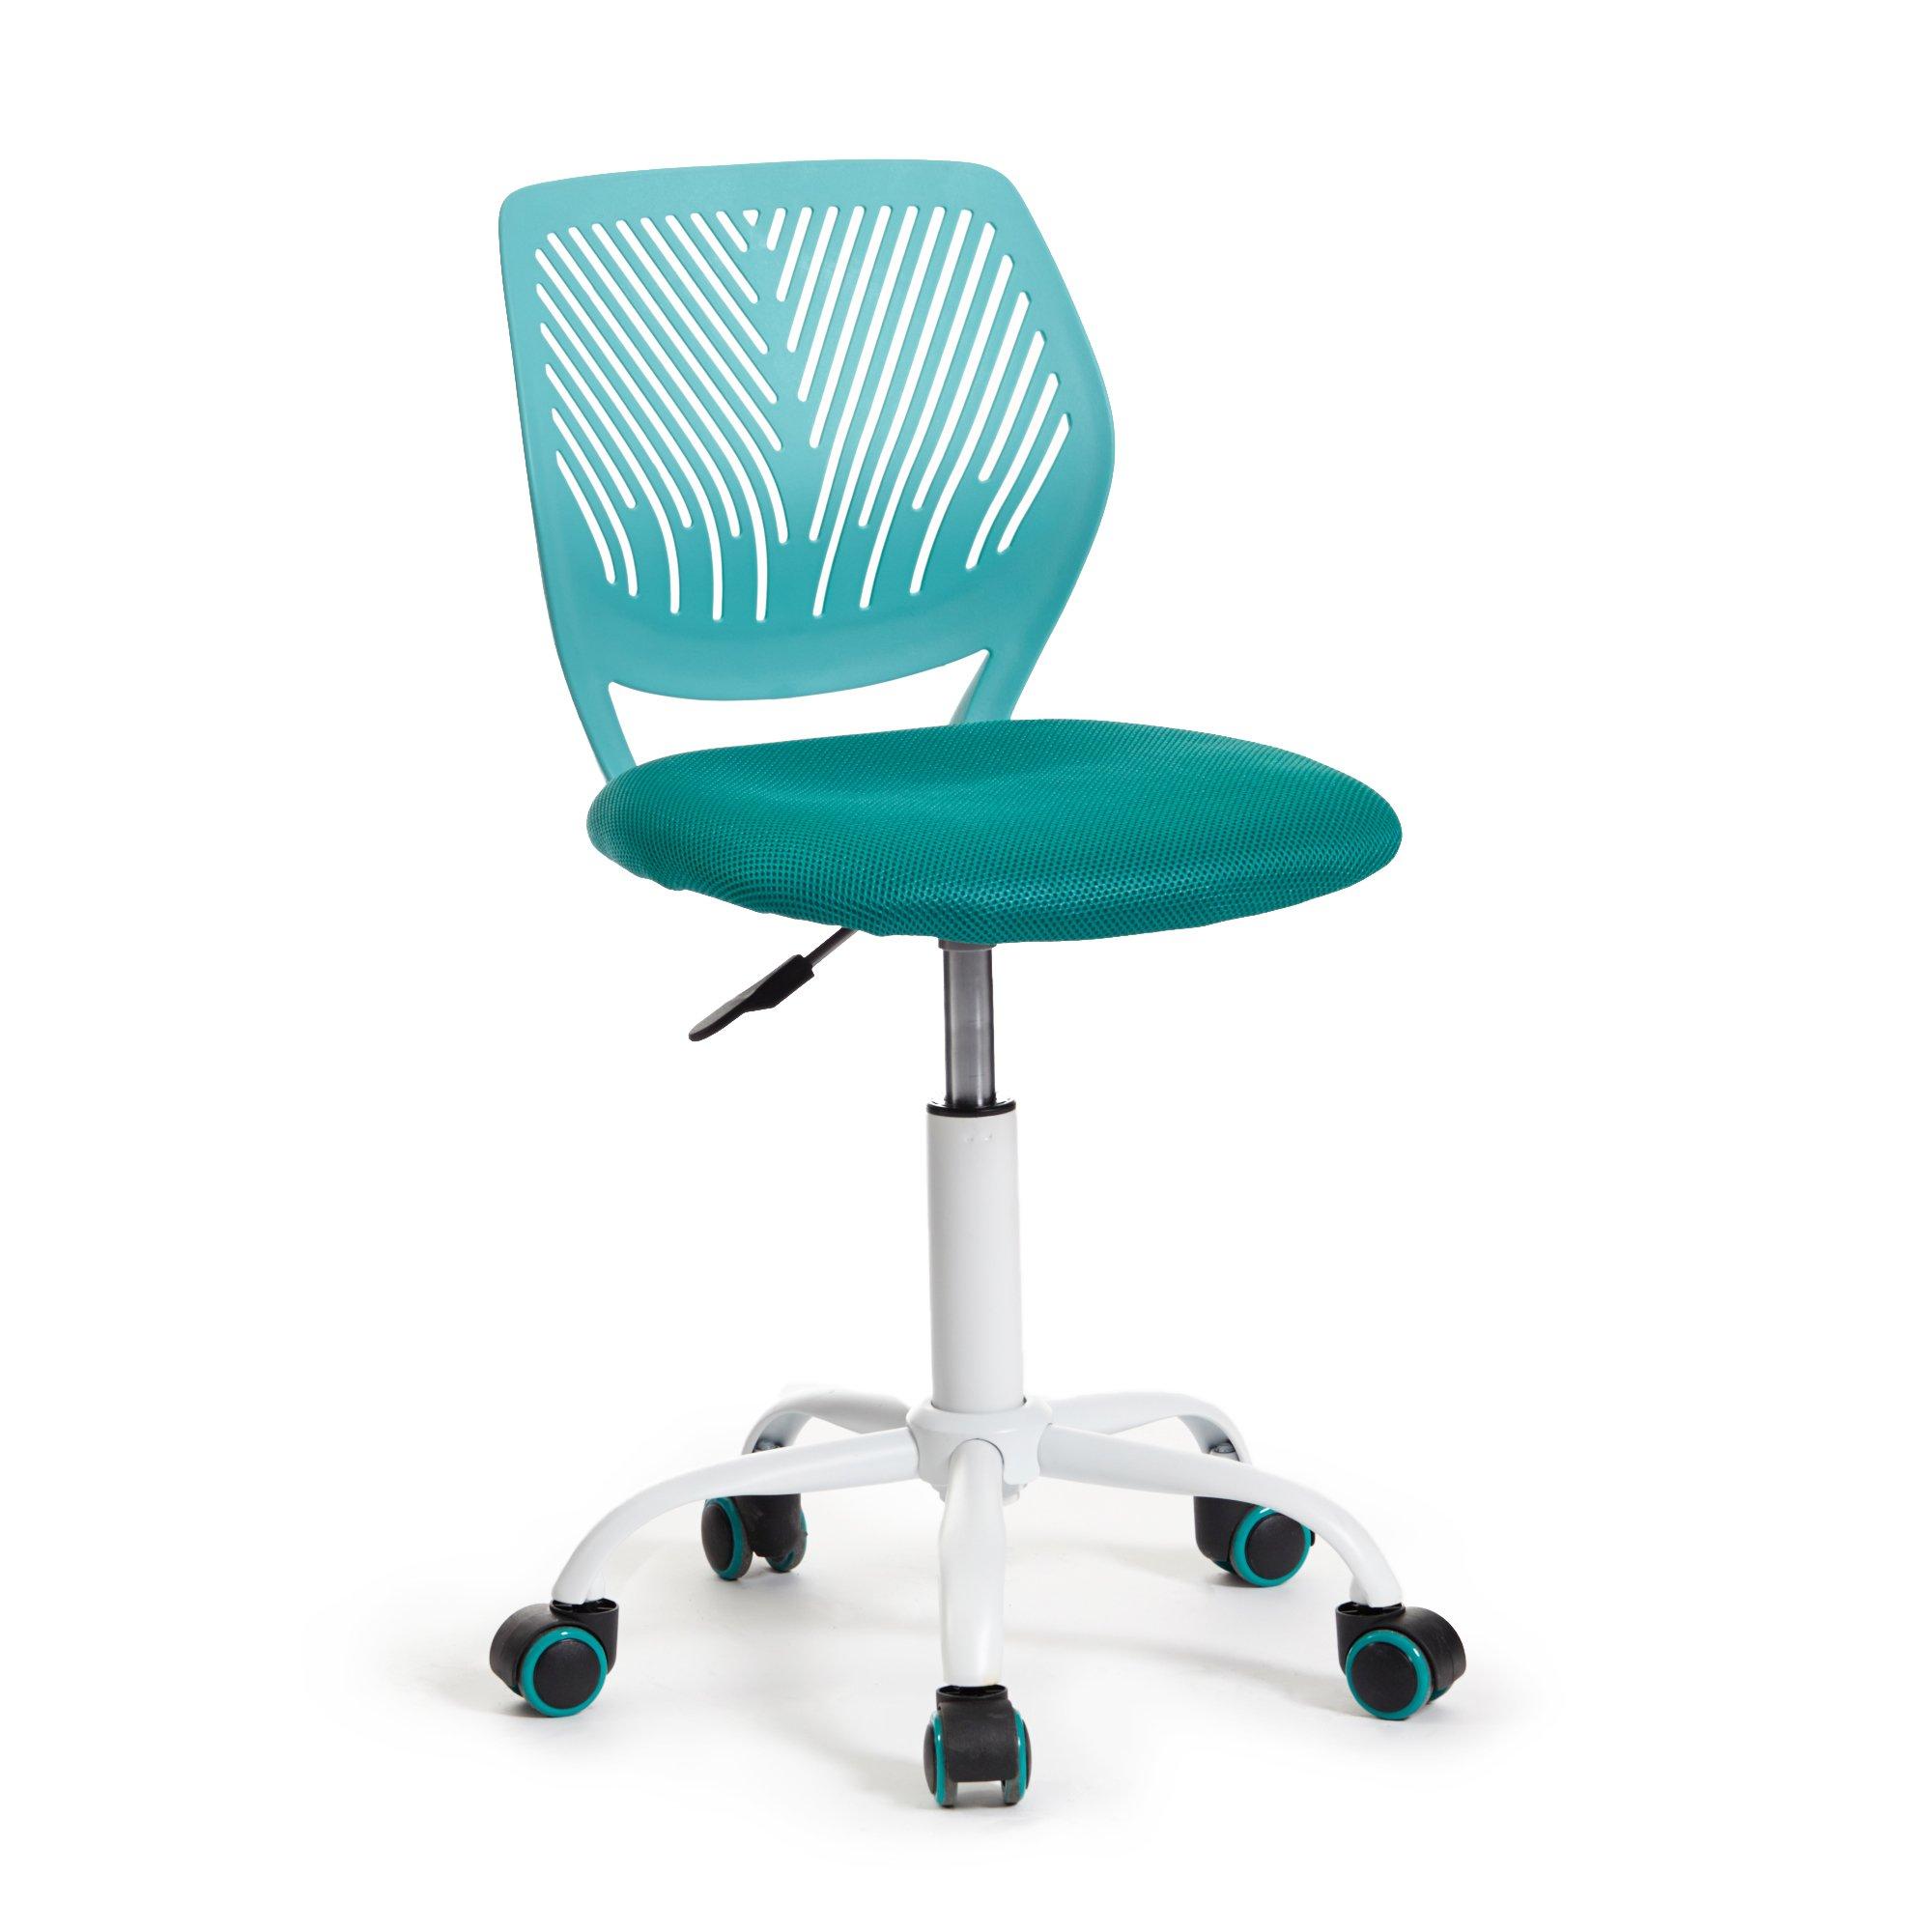 teen desk chairs amazon com rh amazon com amazon desk chair floor mat amazon desk chair mat